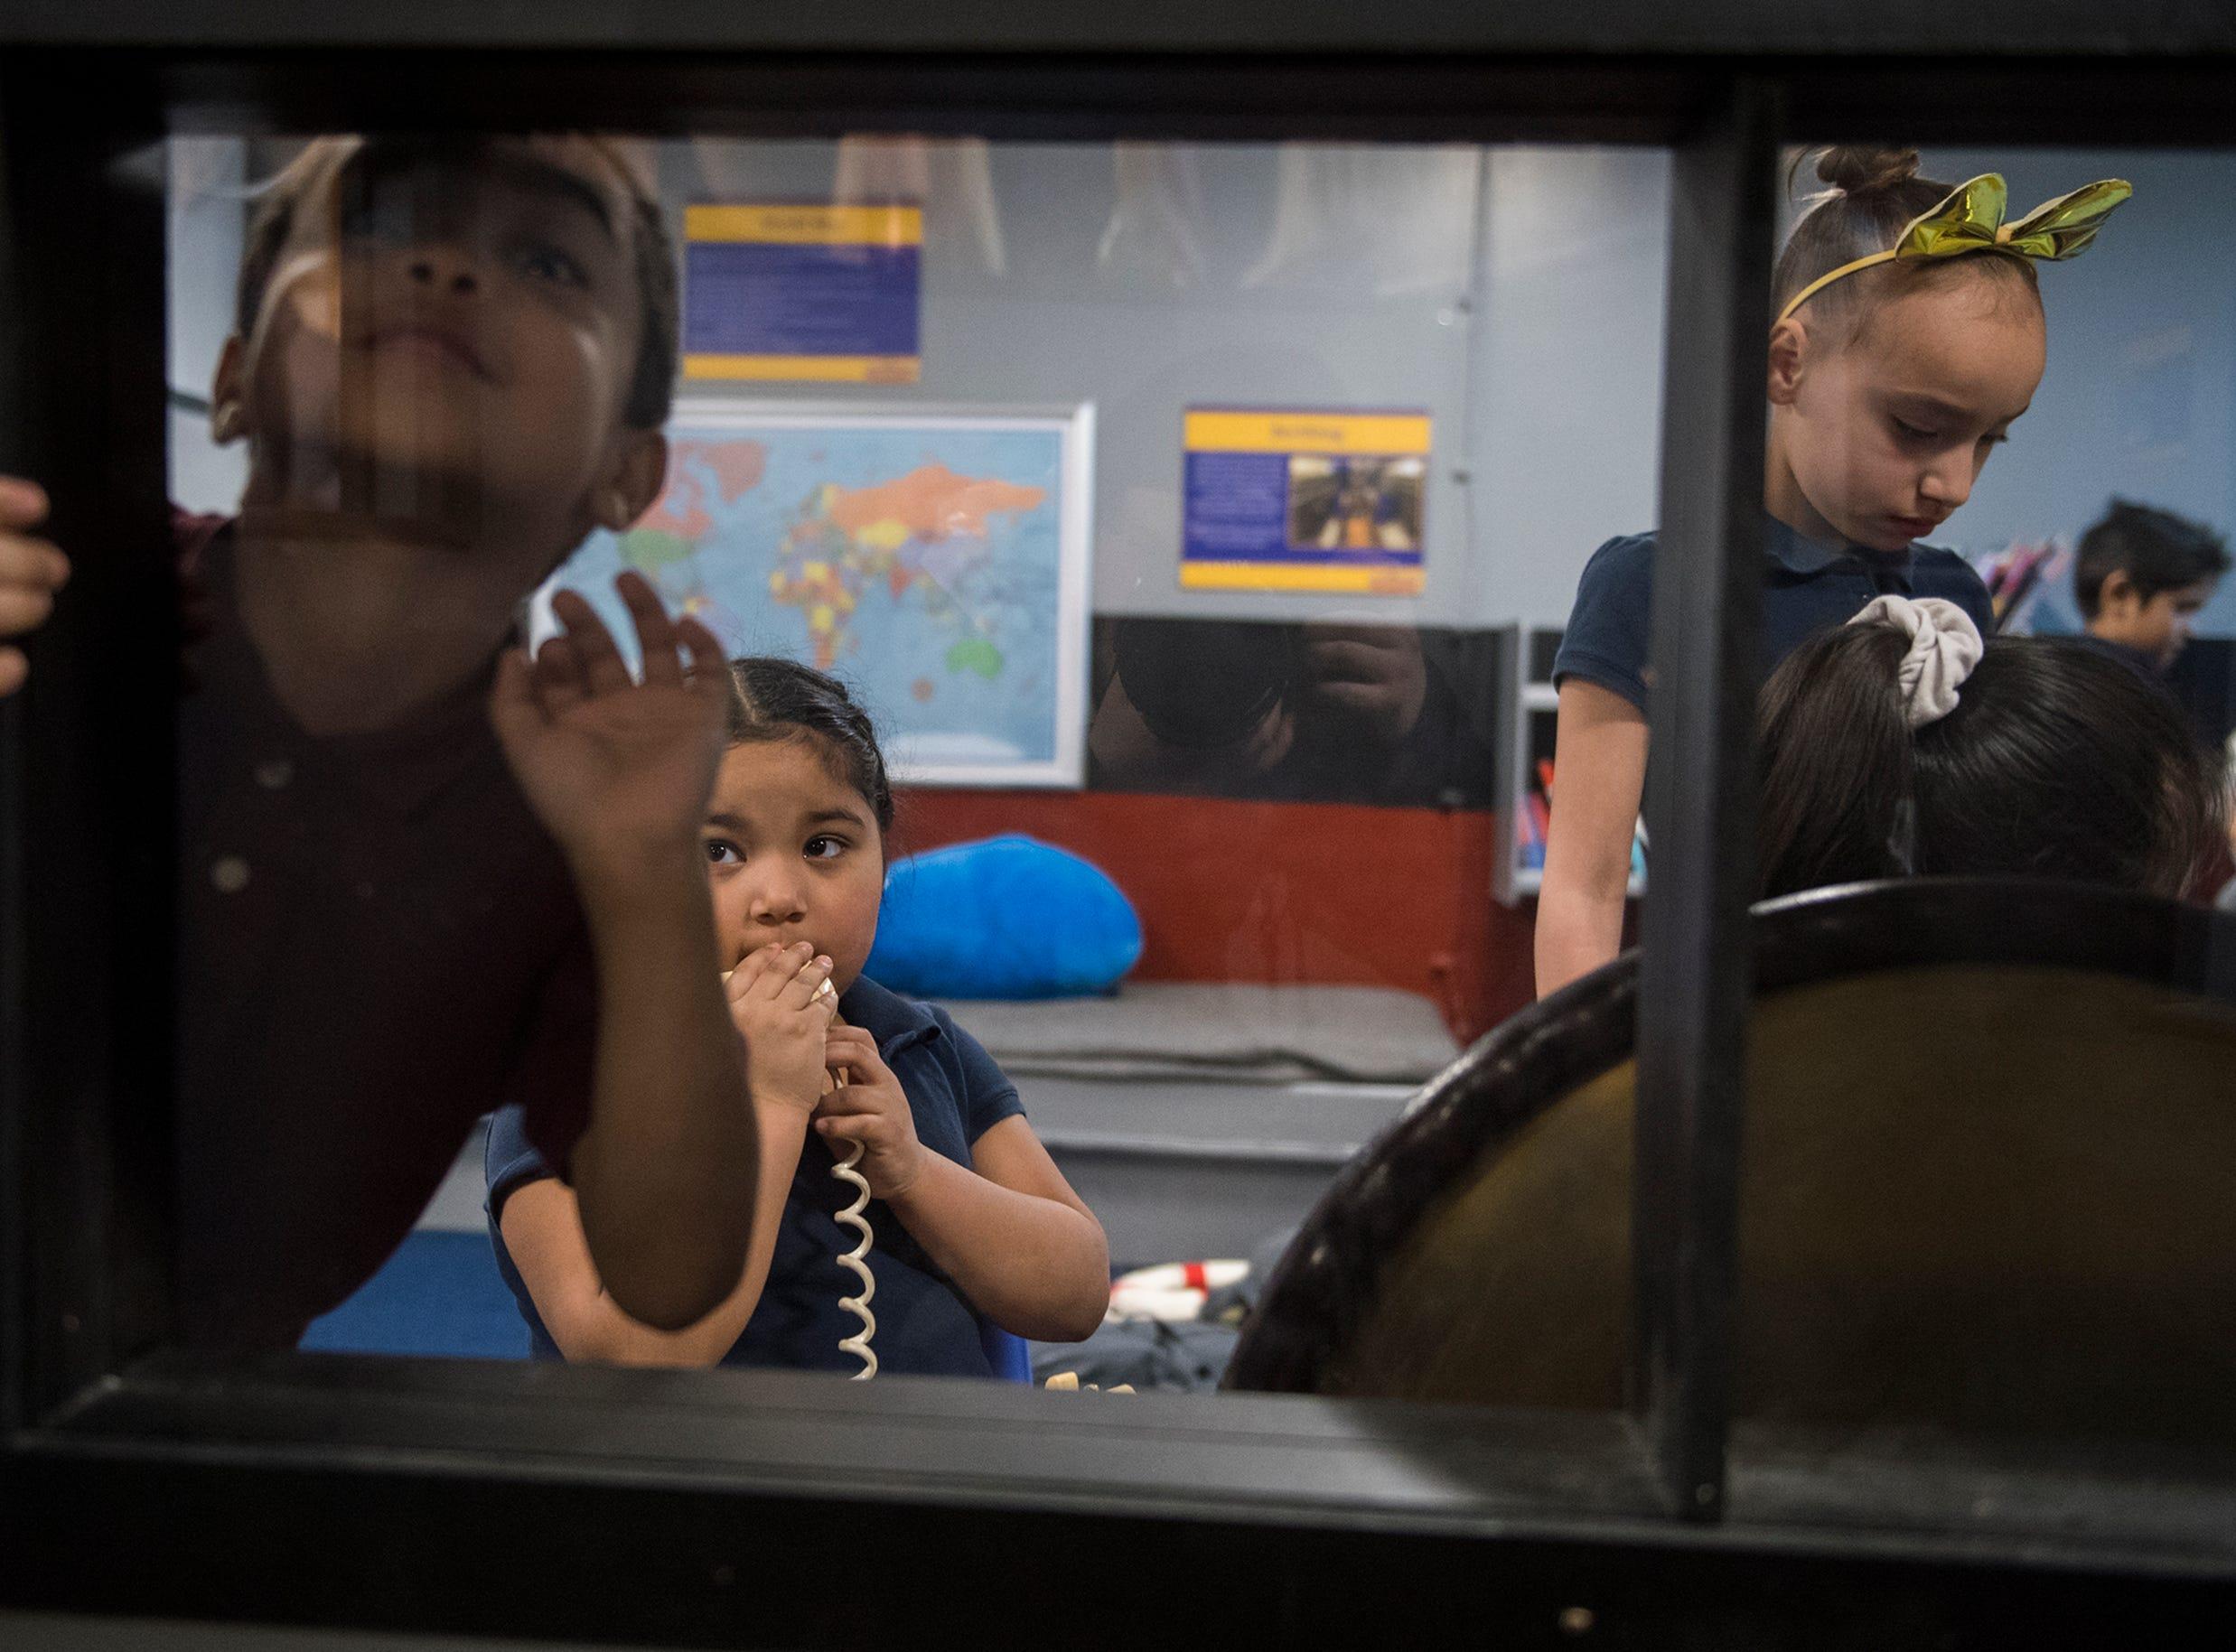 Pre-schoolers play inside Jason's Kids Kompartment Thursday, March 21, 2019 aboard the USS New Jersey battleship in Camden, N.J.